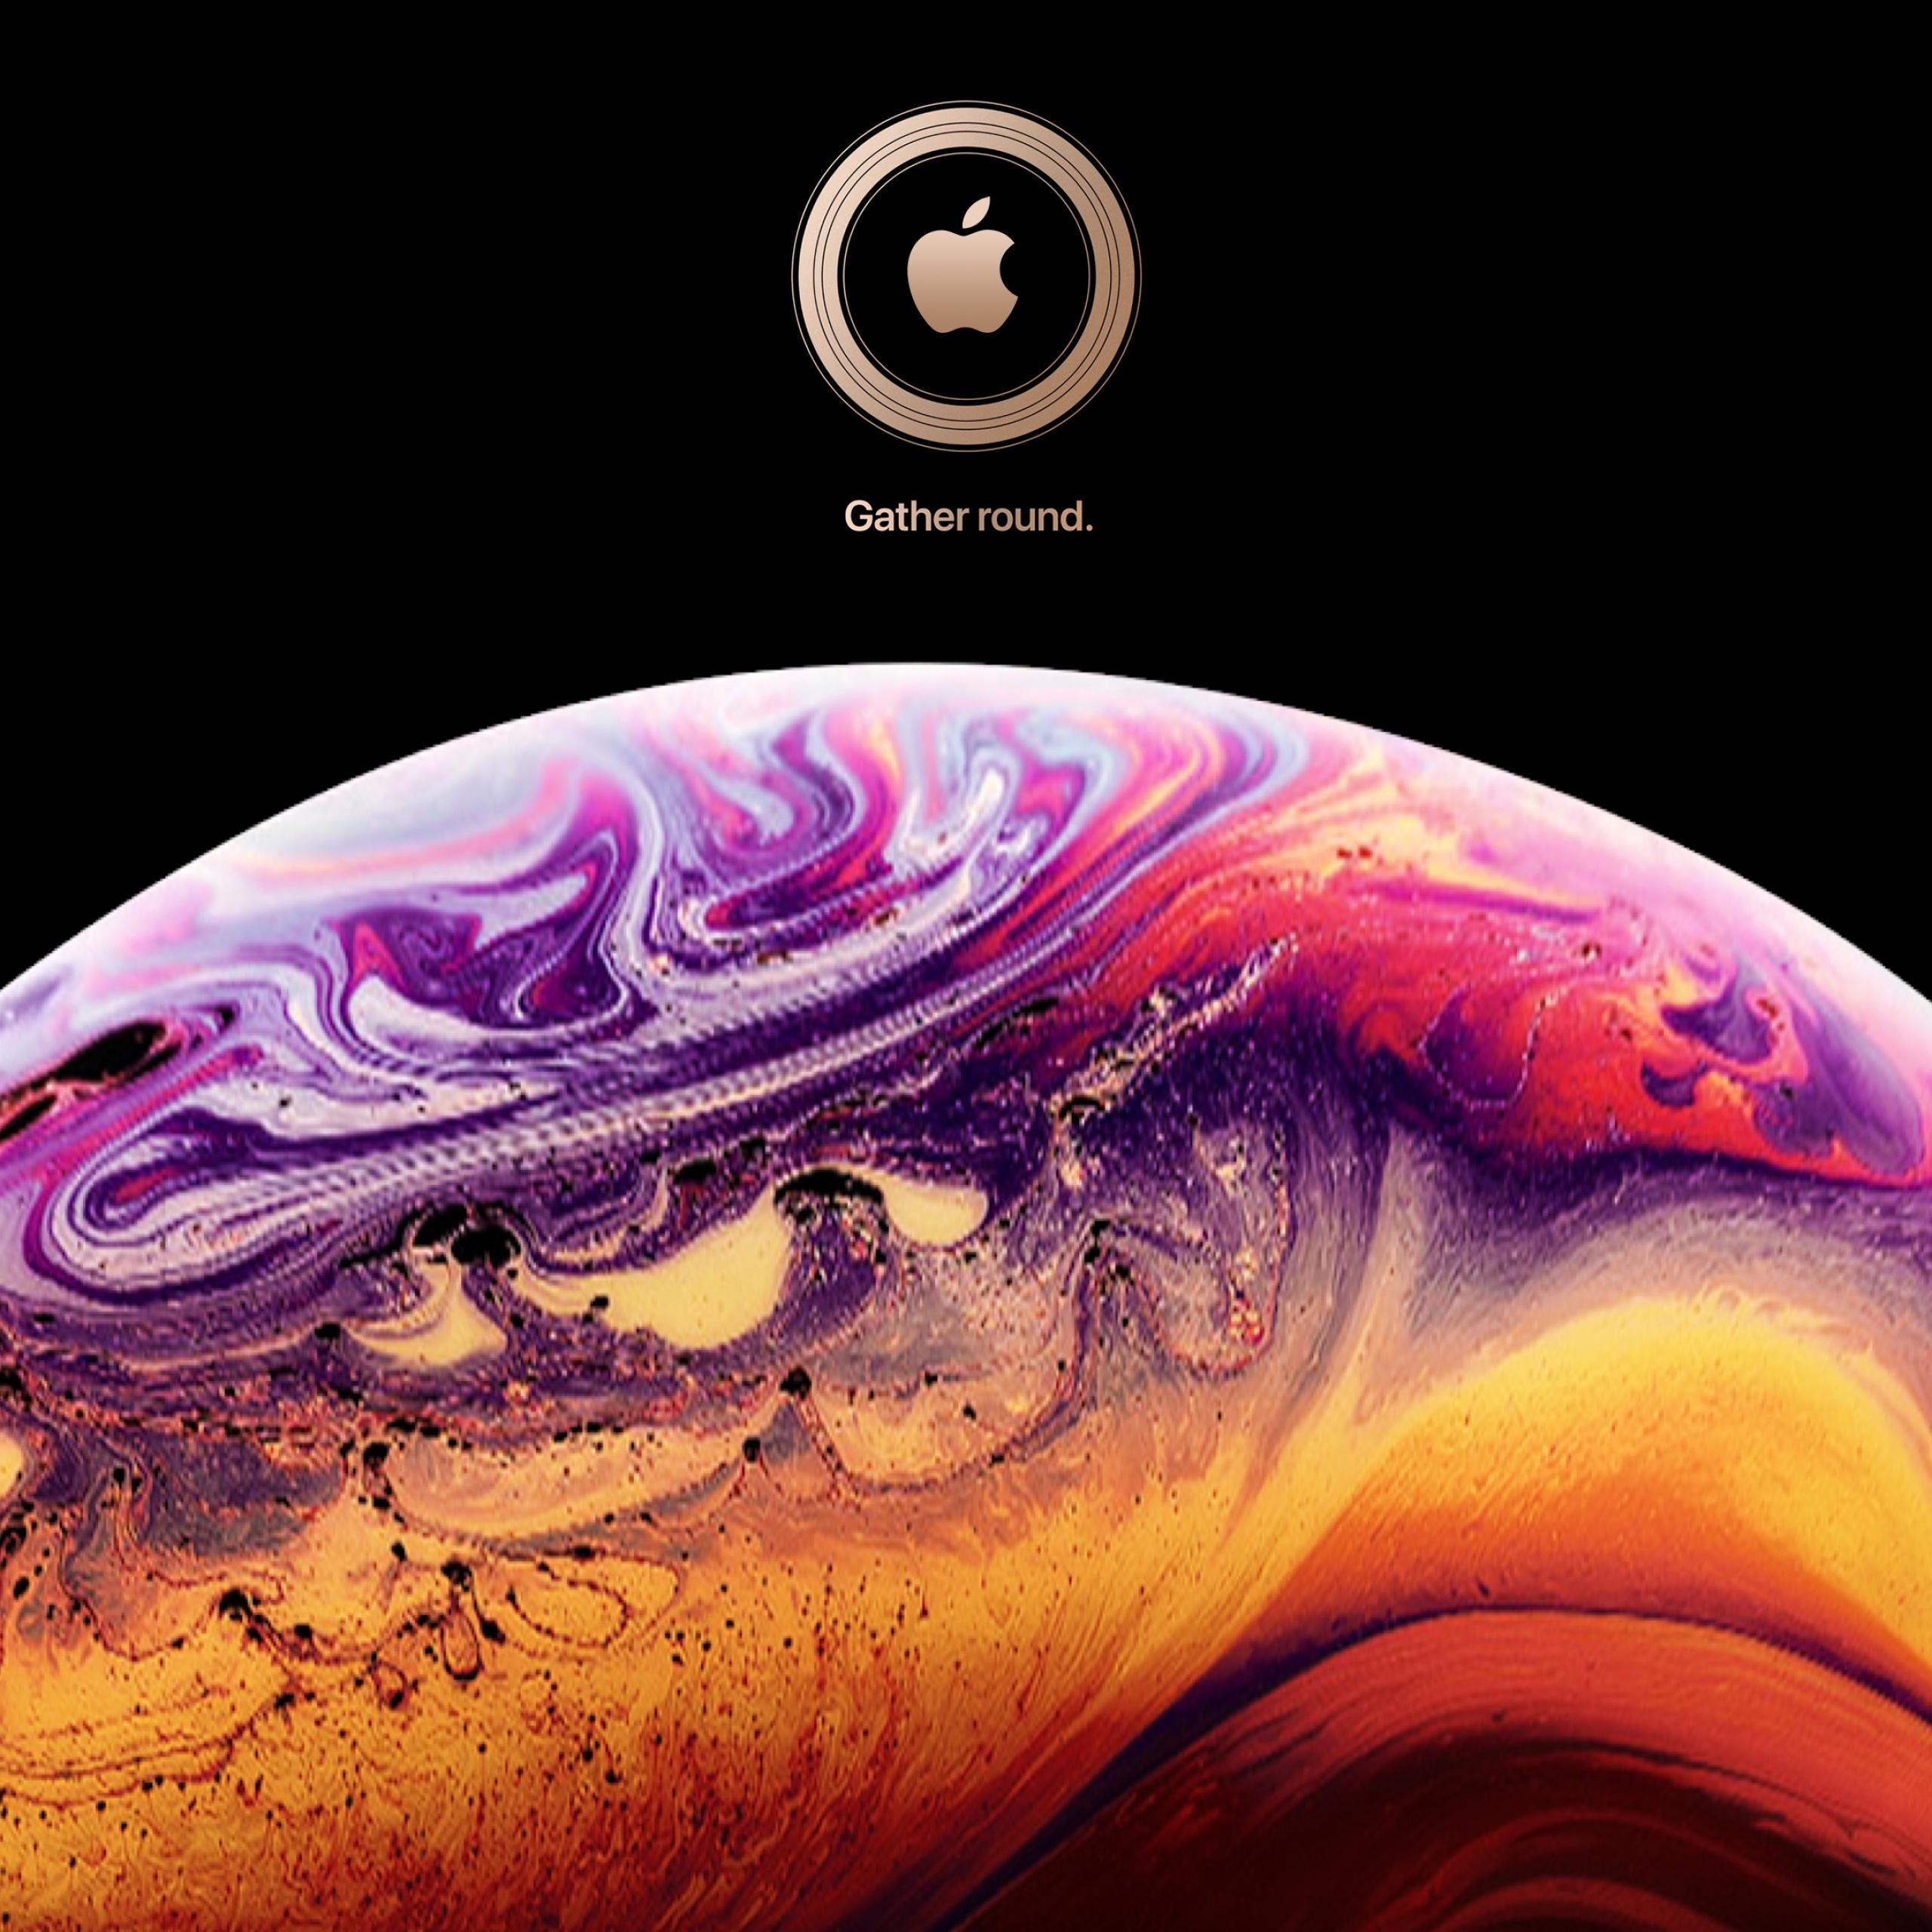 Ios 12 4k Wallpaper Iphone Xs Stock Black Background Technology 1568